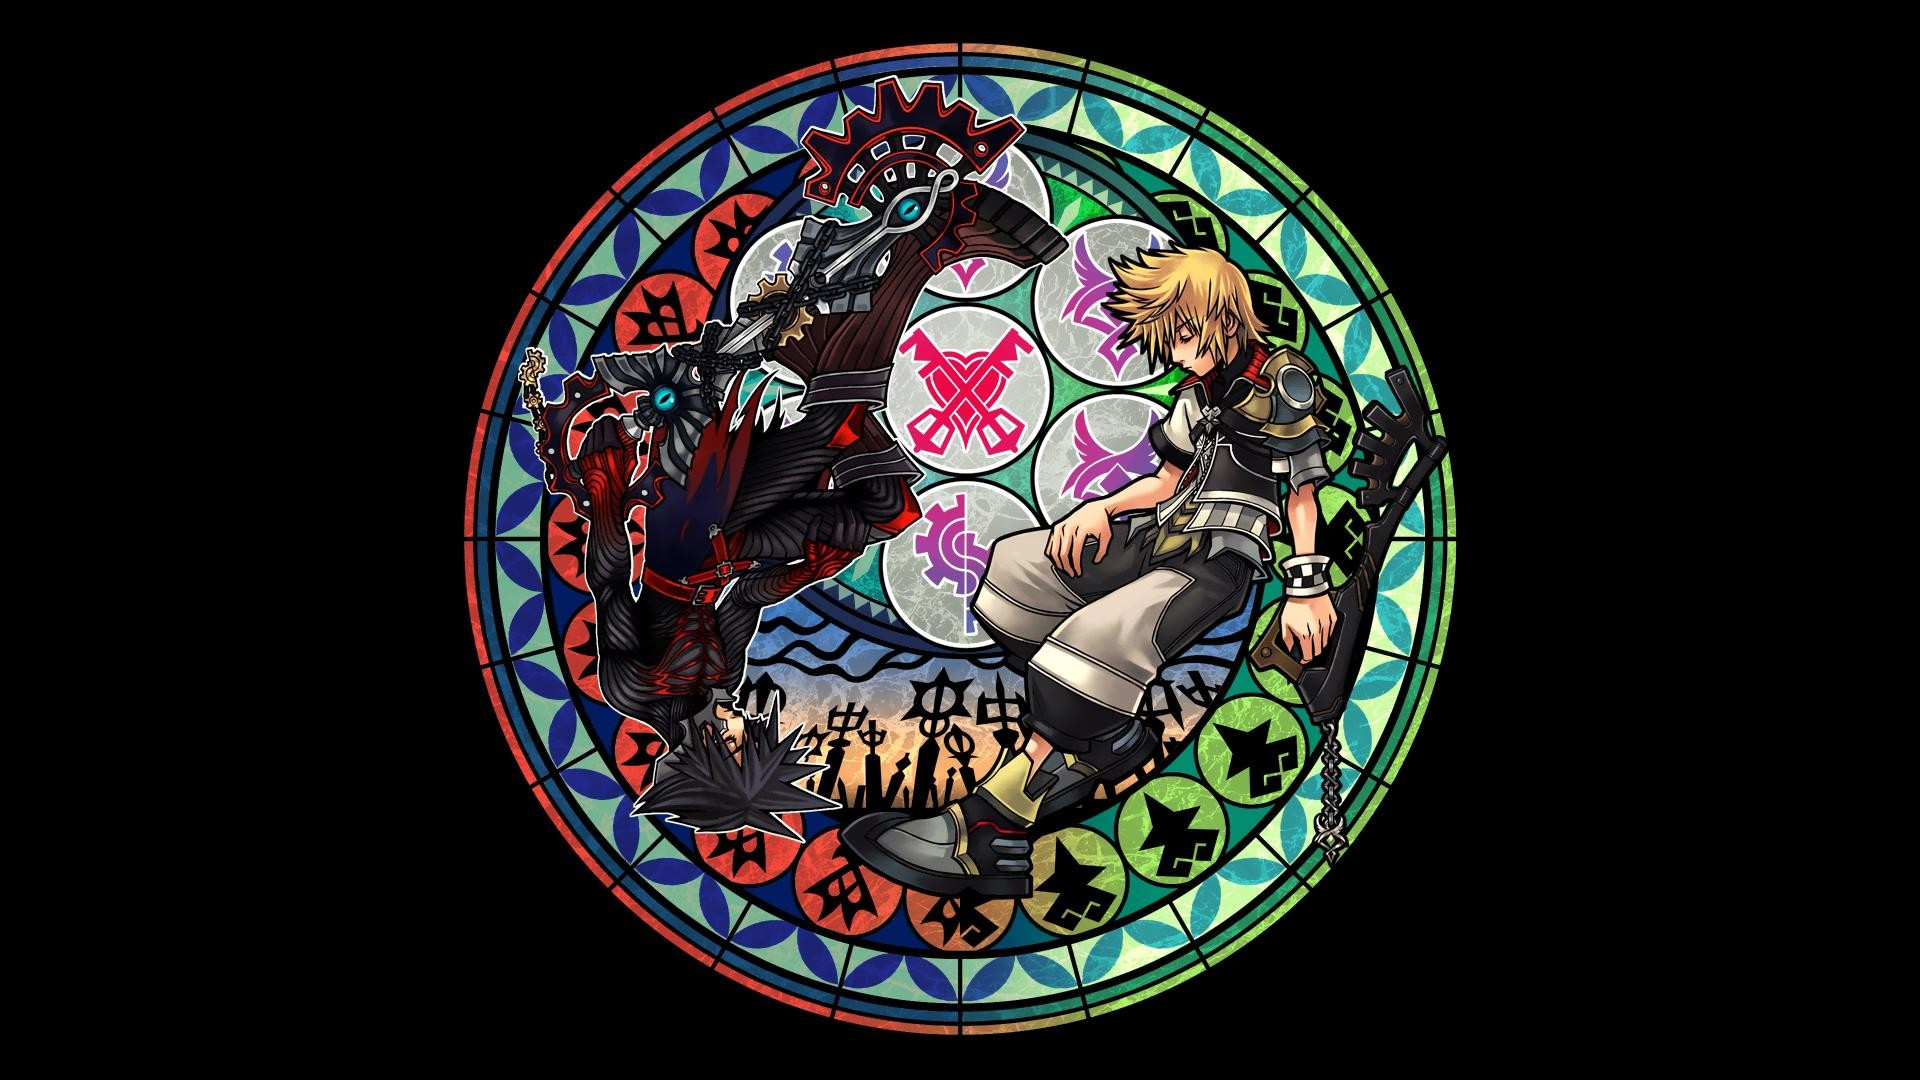 Explore Kingdom Hearts Wallpaper and more!